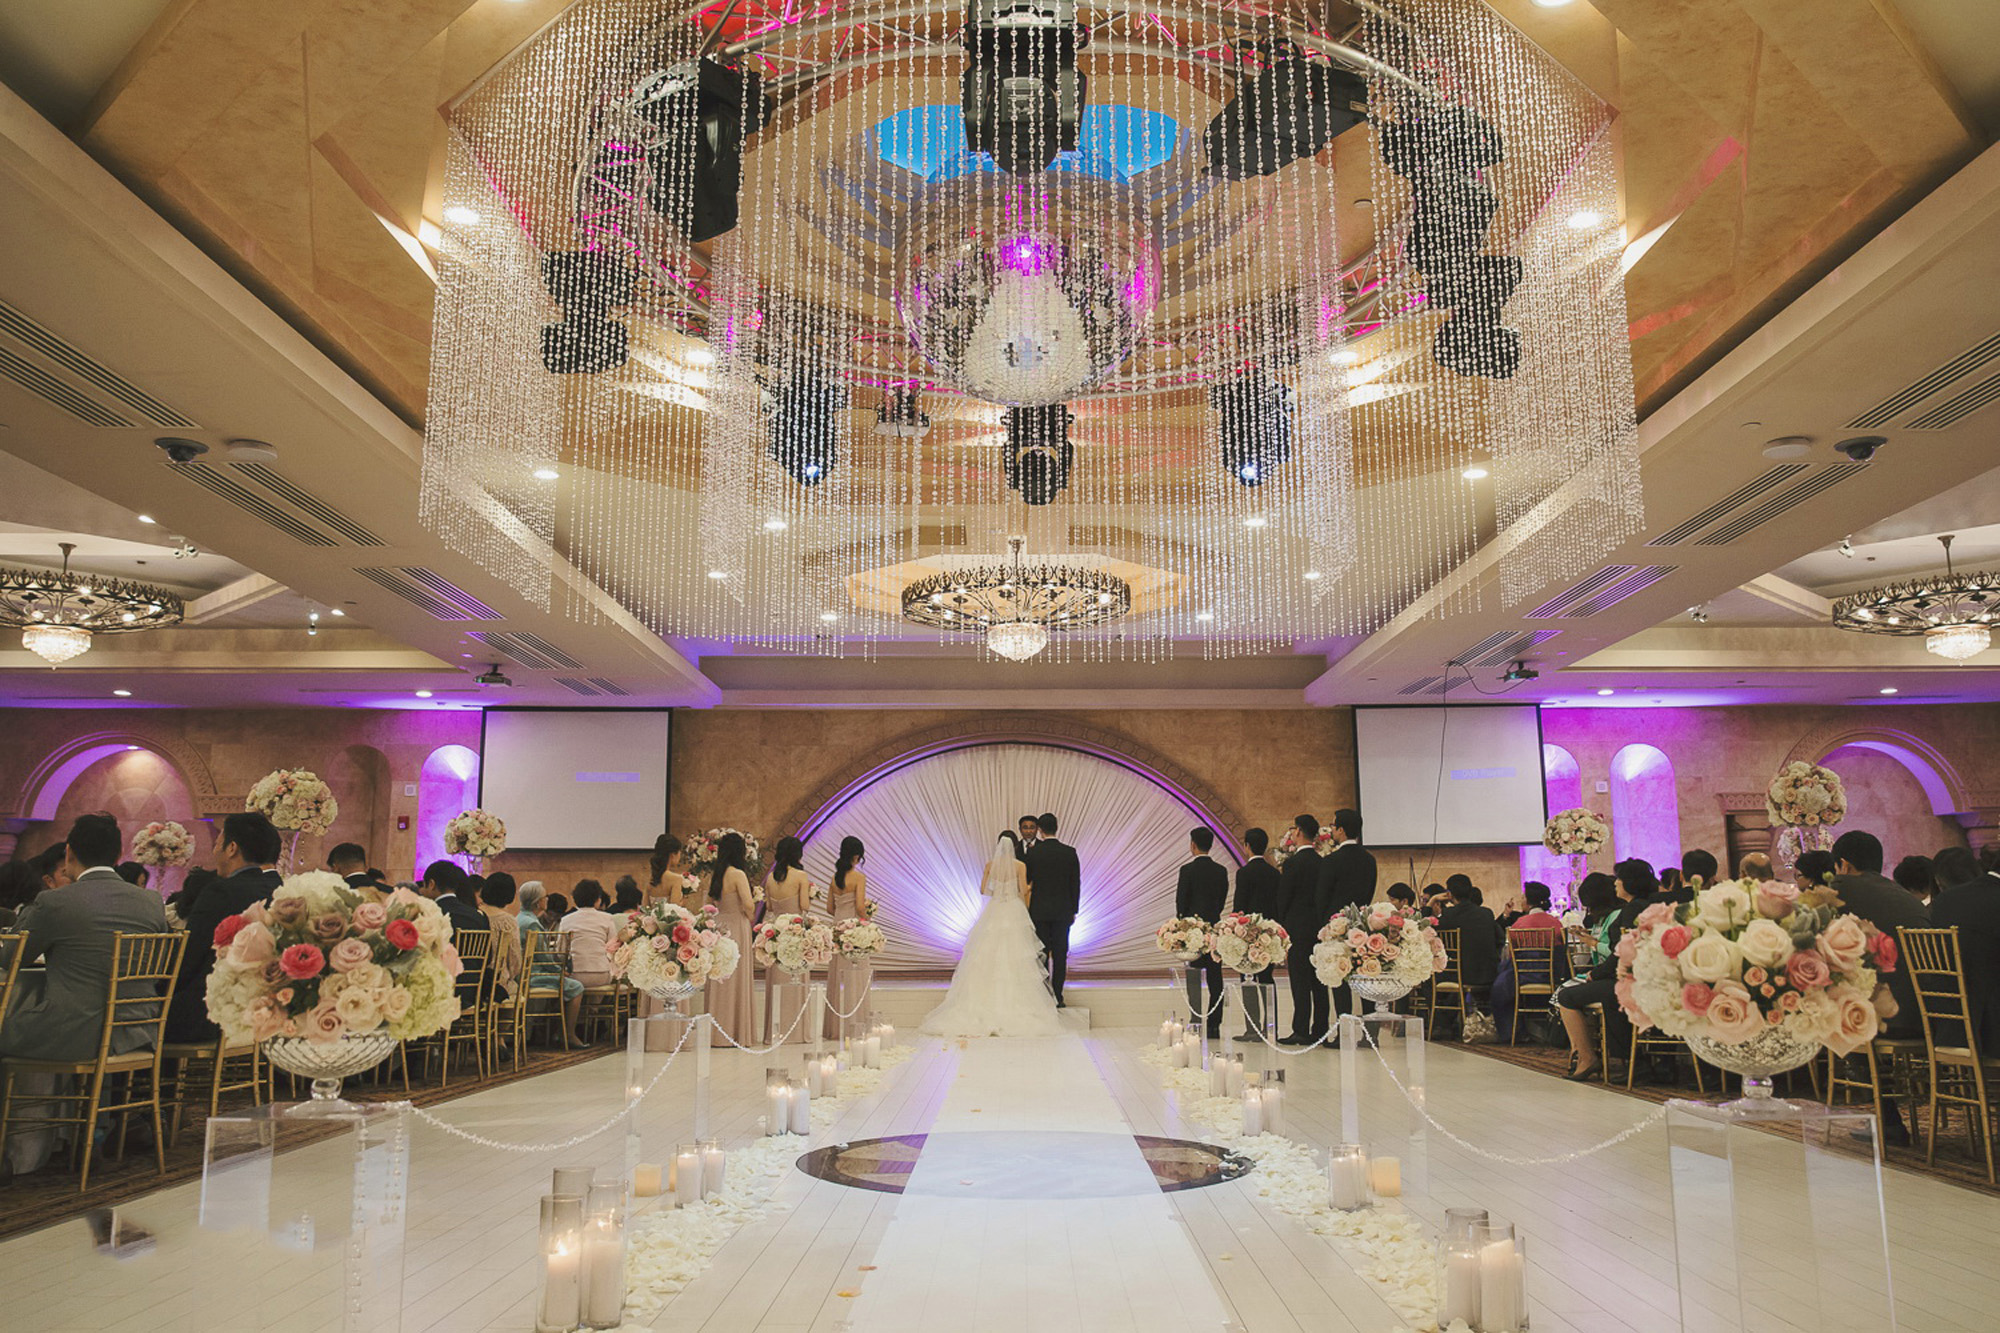 Le Foyer Ballroom : Largest event wedding venue in n hollywood ca le